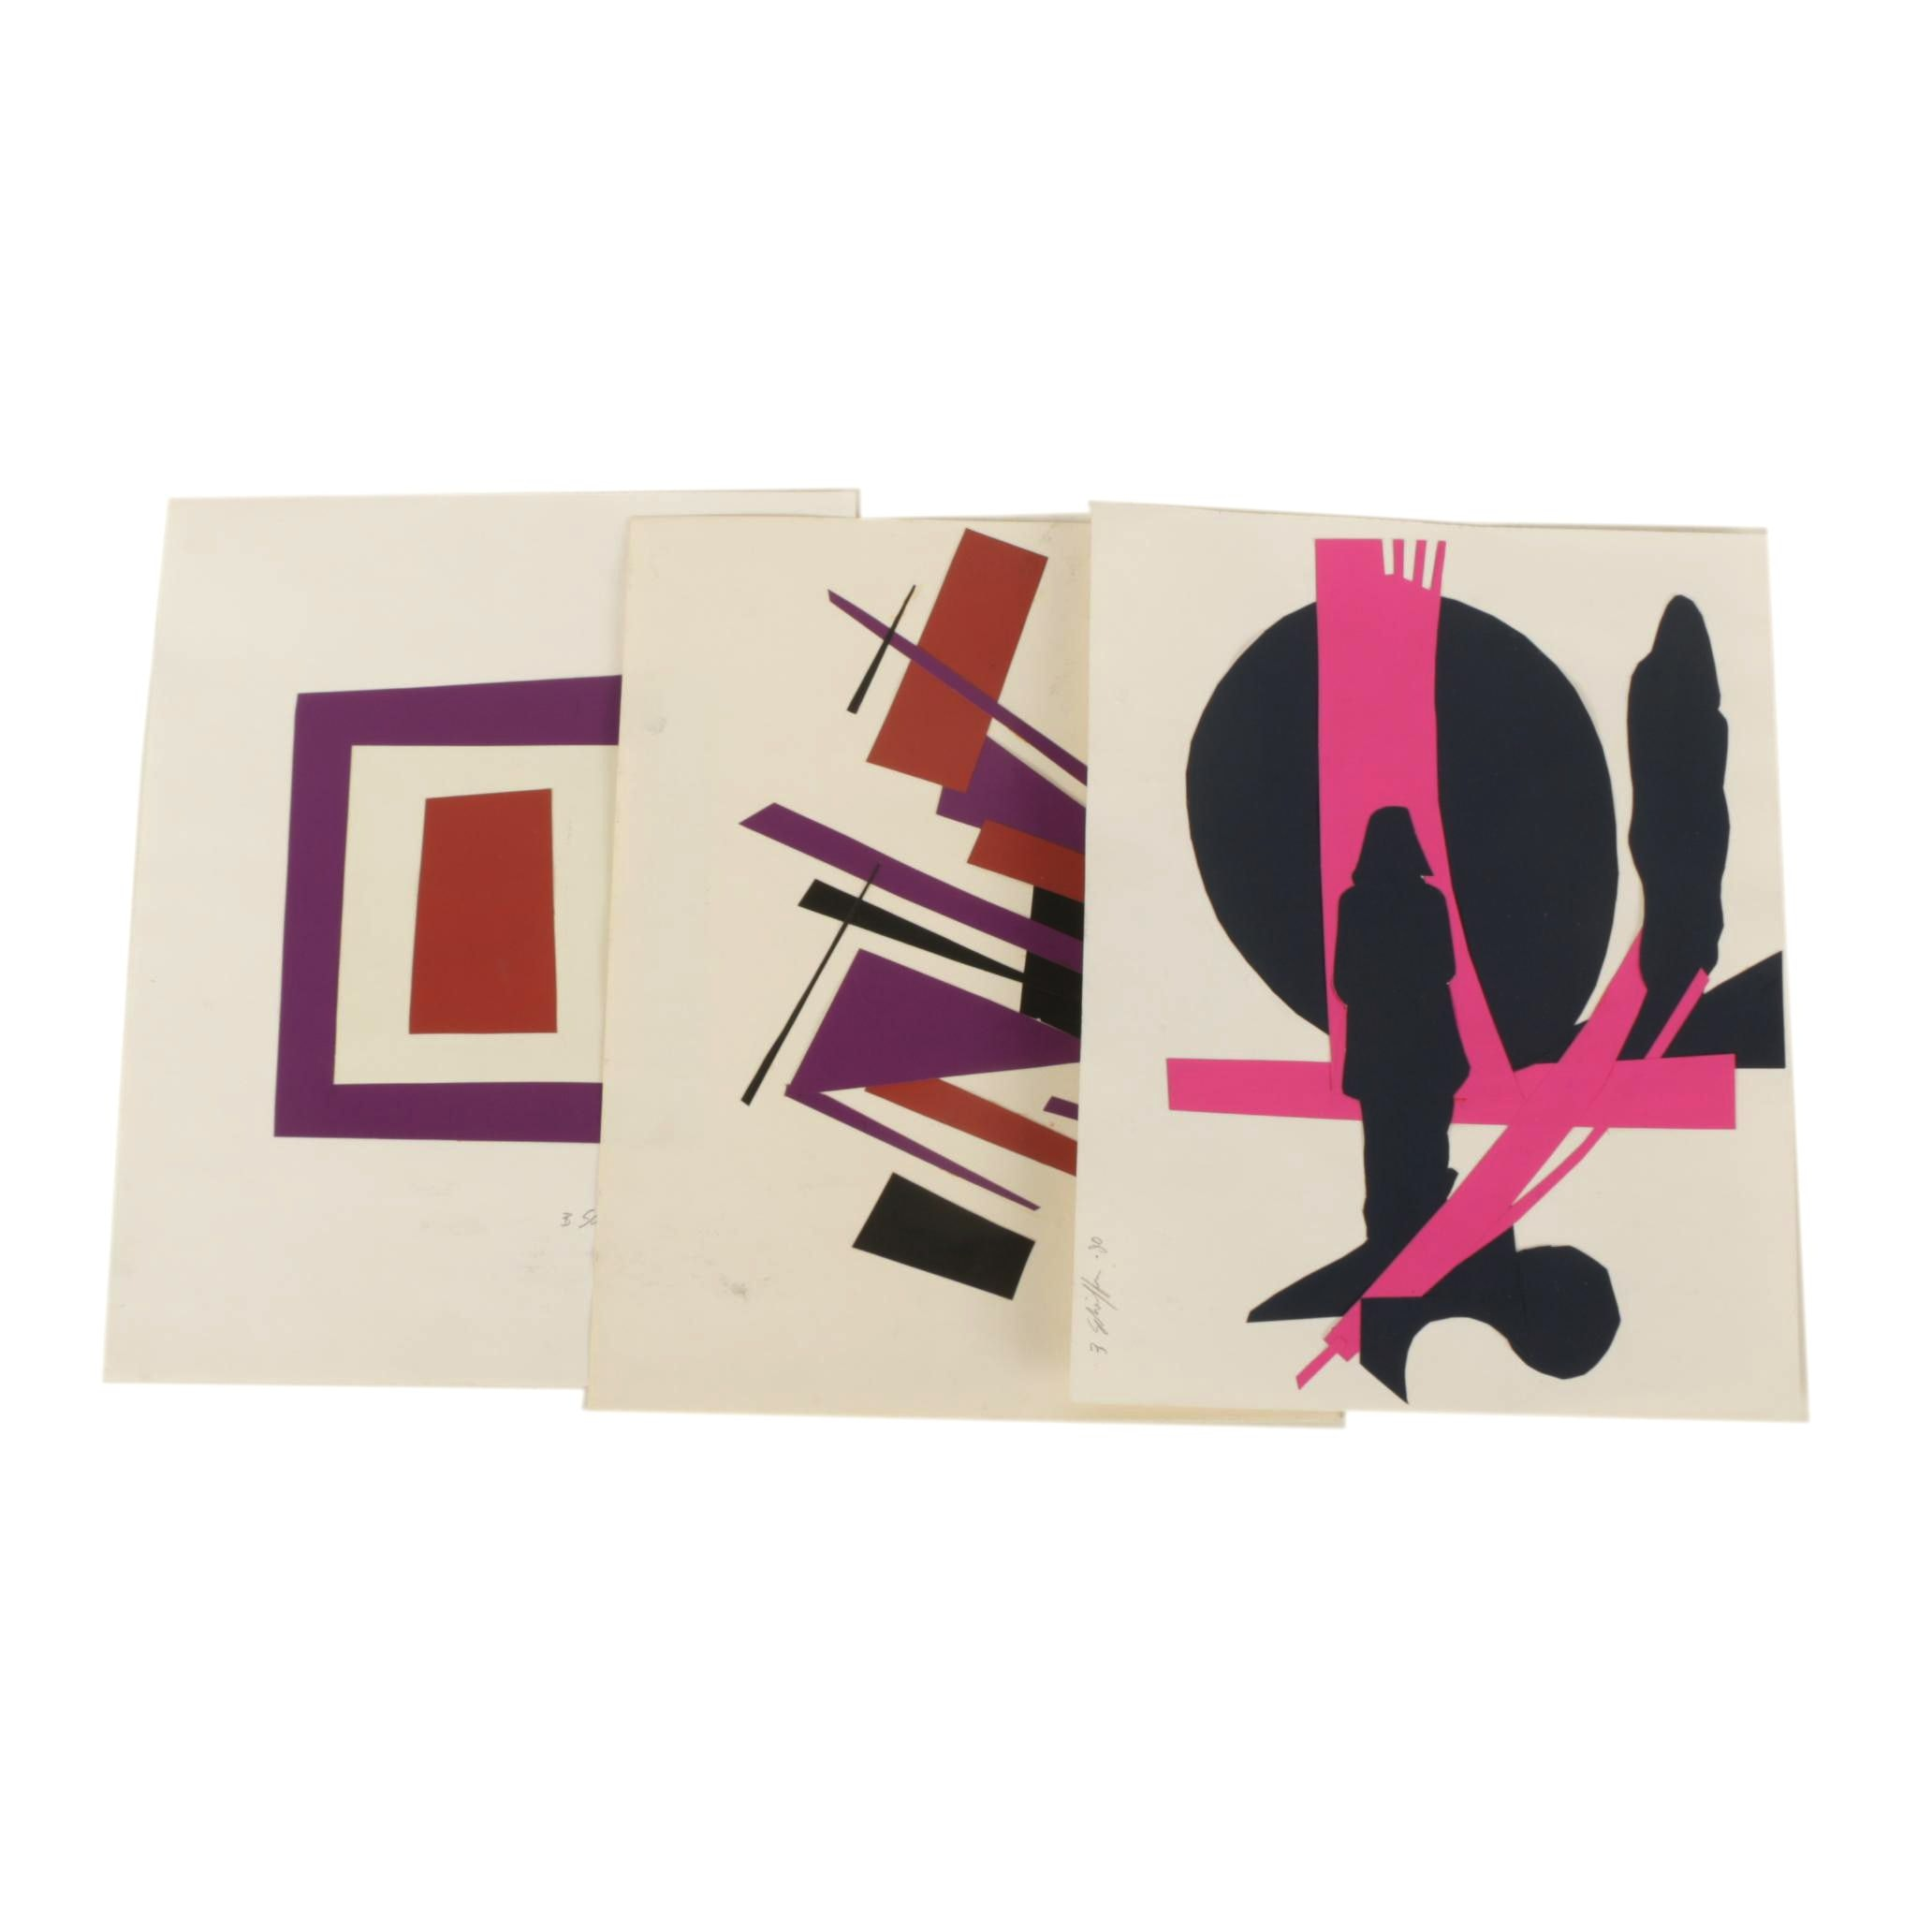 Bill Schiffer Cut-Paper Collages